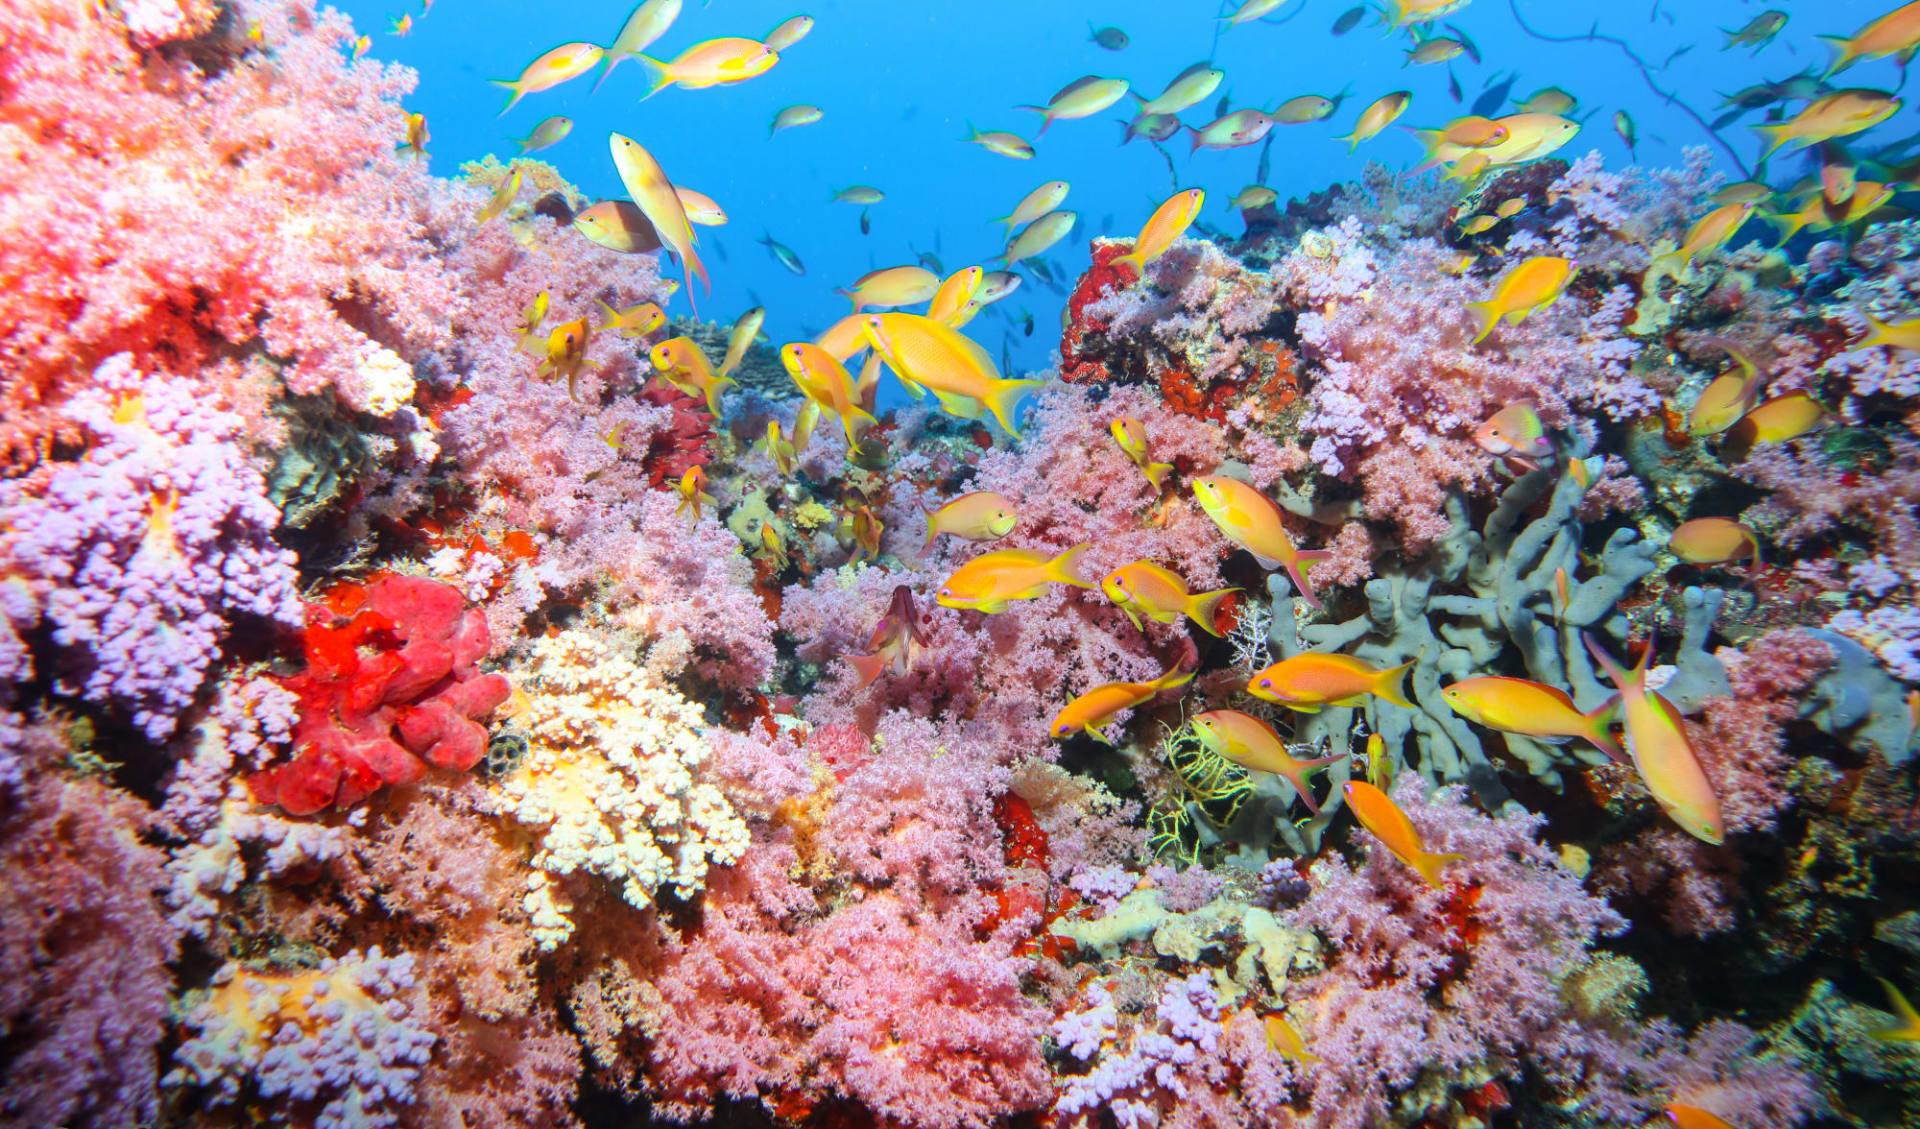 Amba ab Haa-Dhaalu-Atoll: Amba